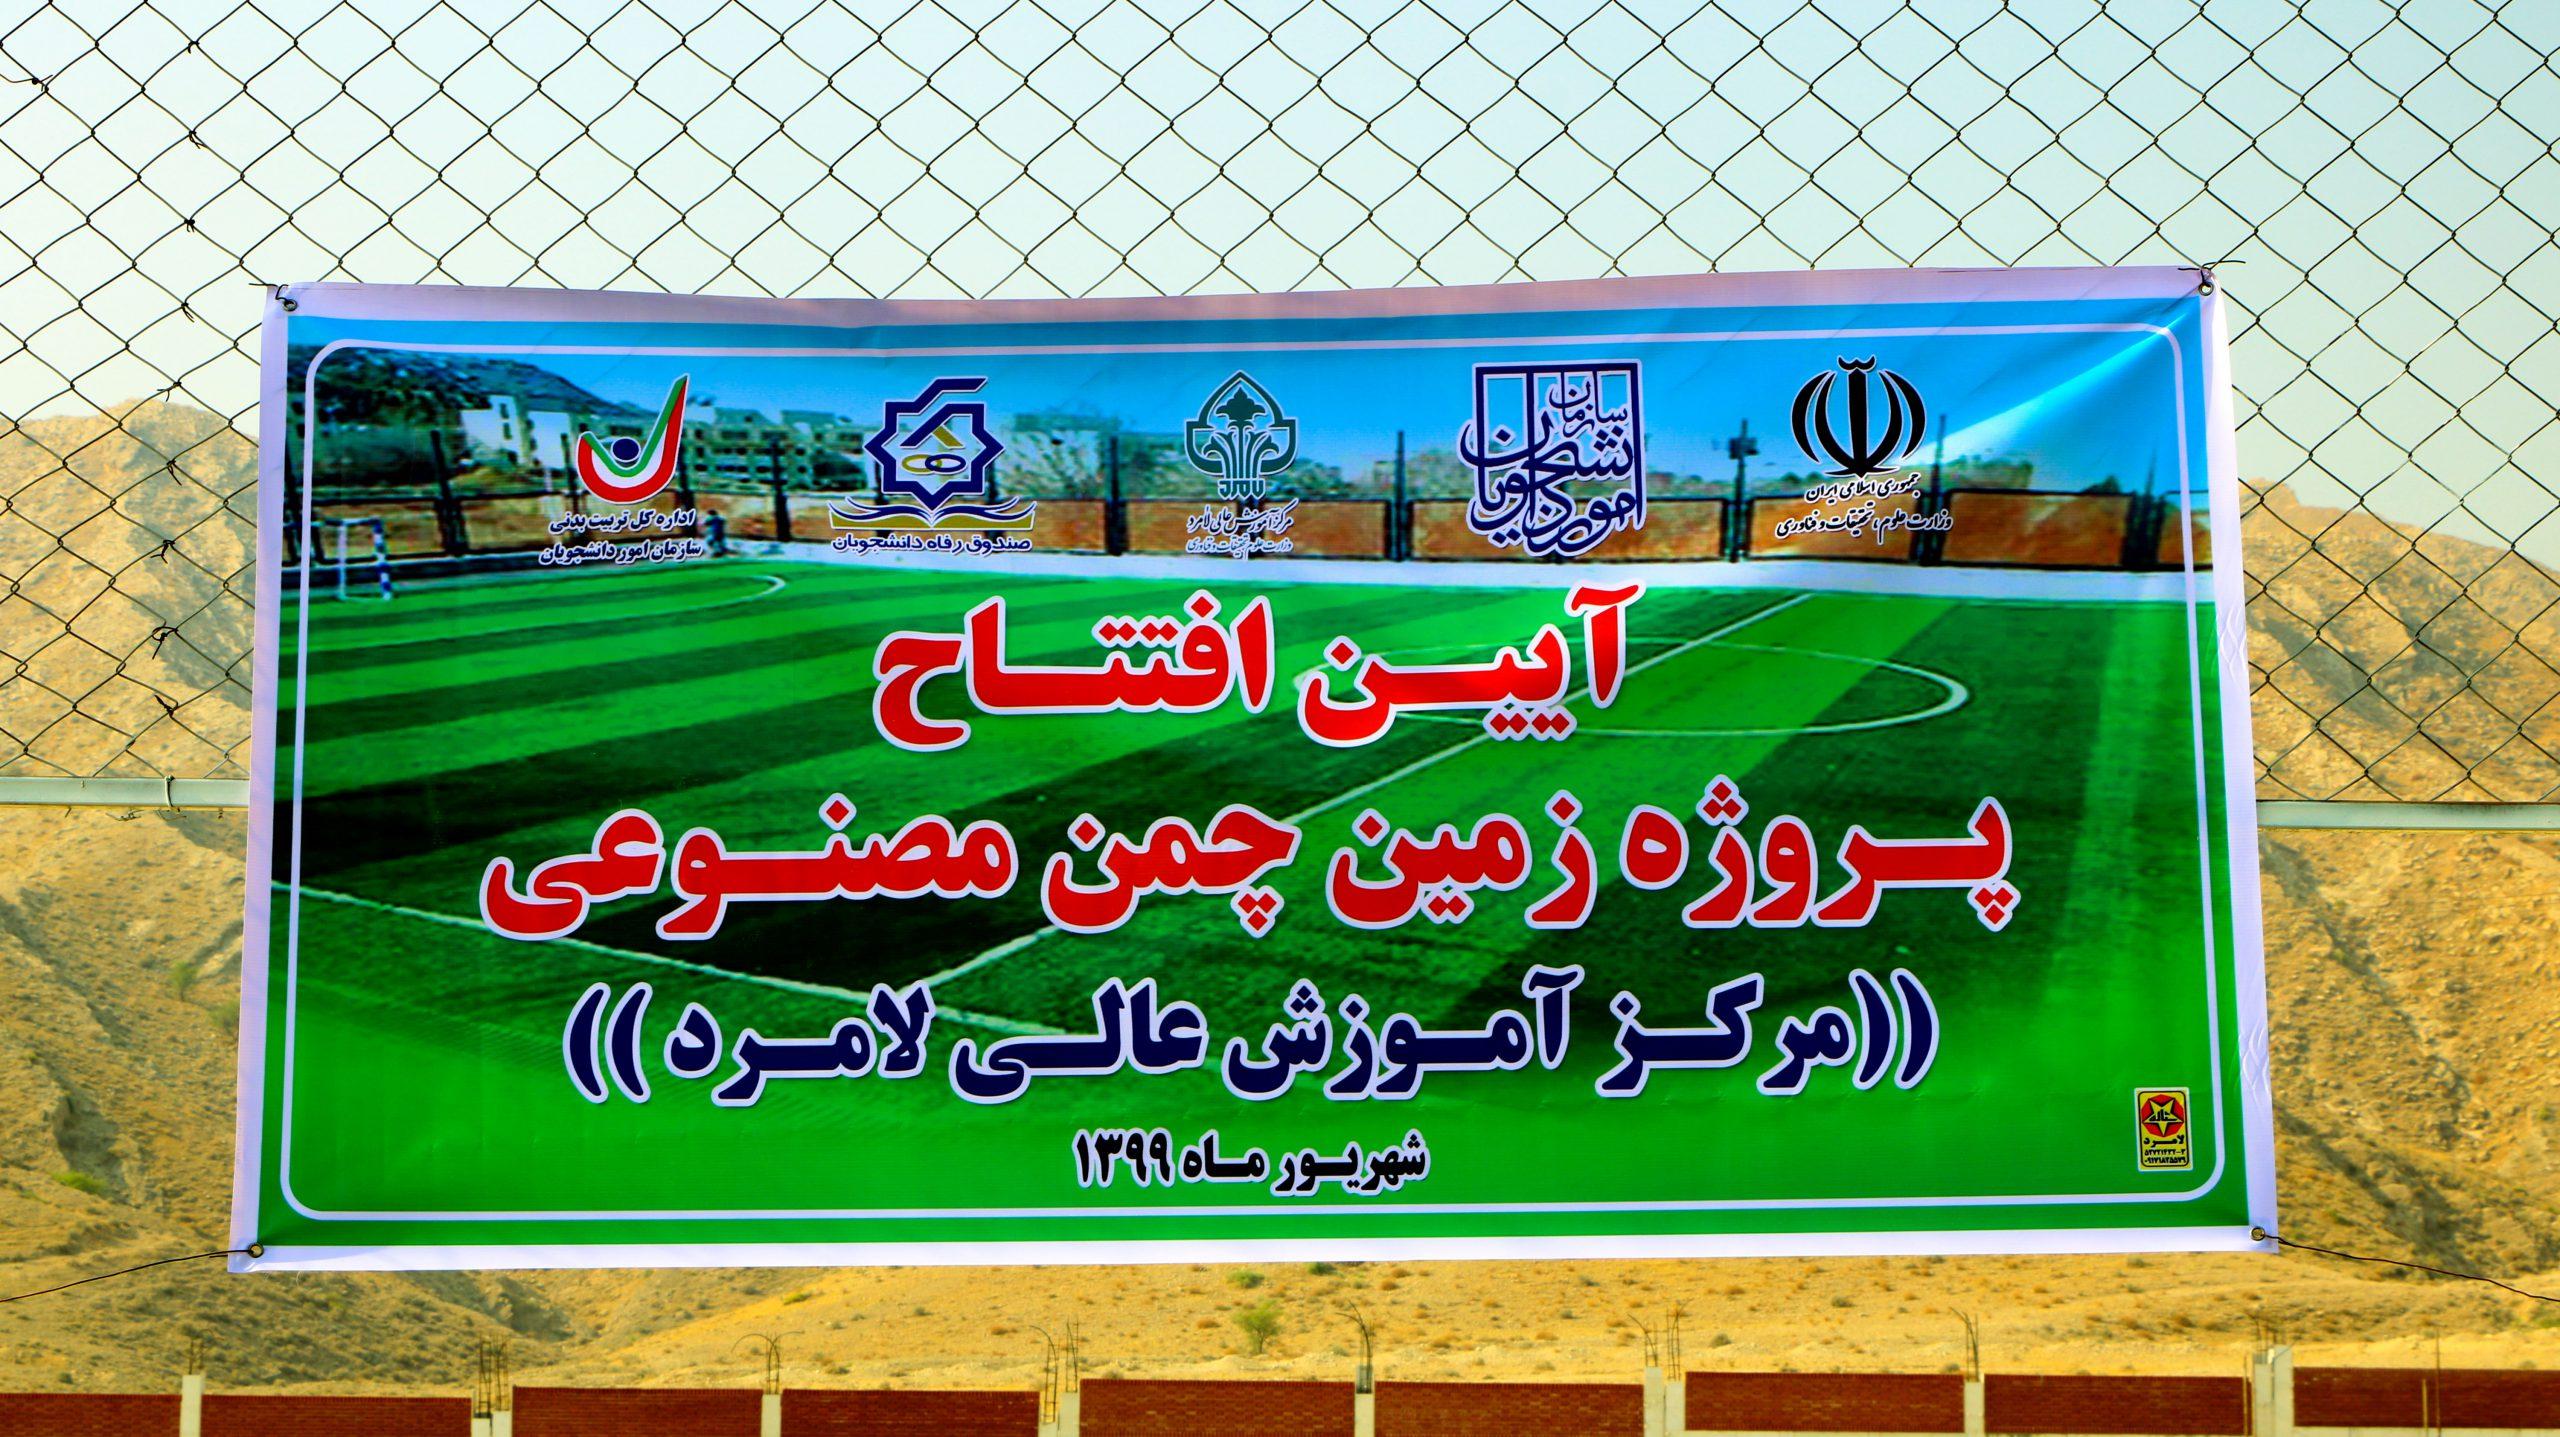 افتتاح زمین چمن مرکزآموزش عالی لامرد